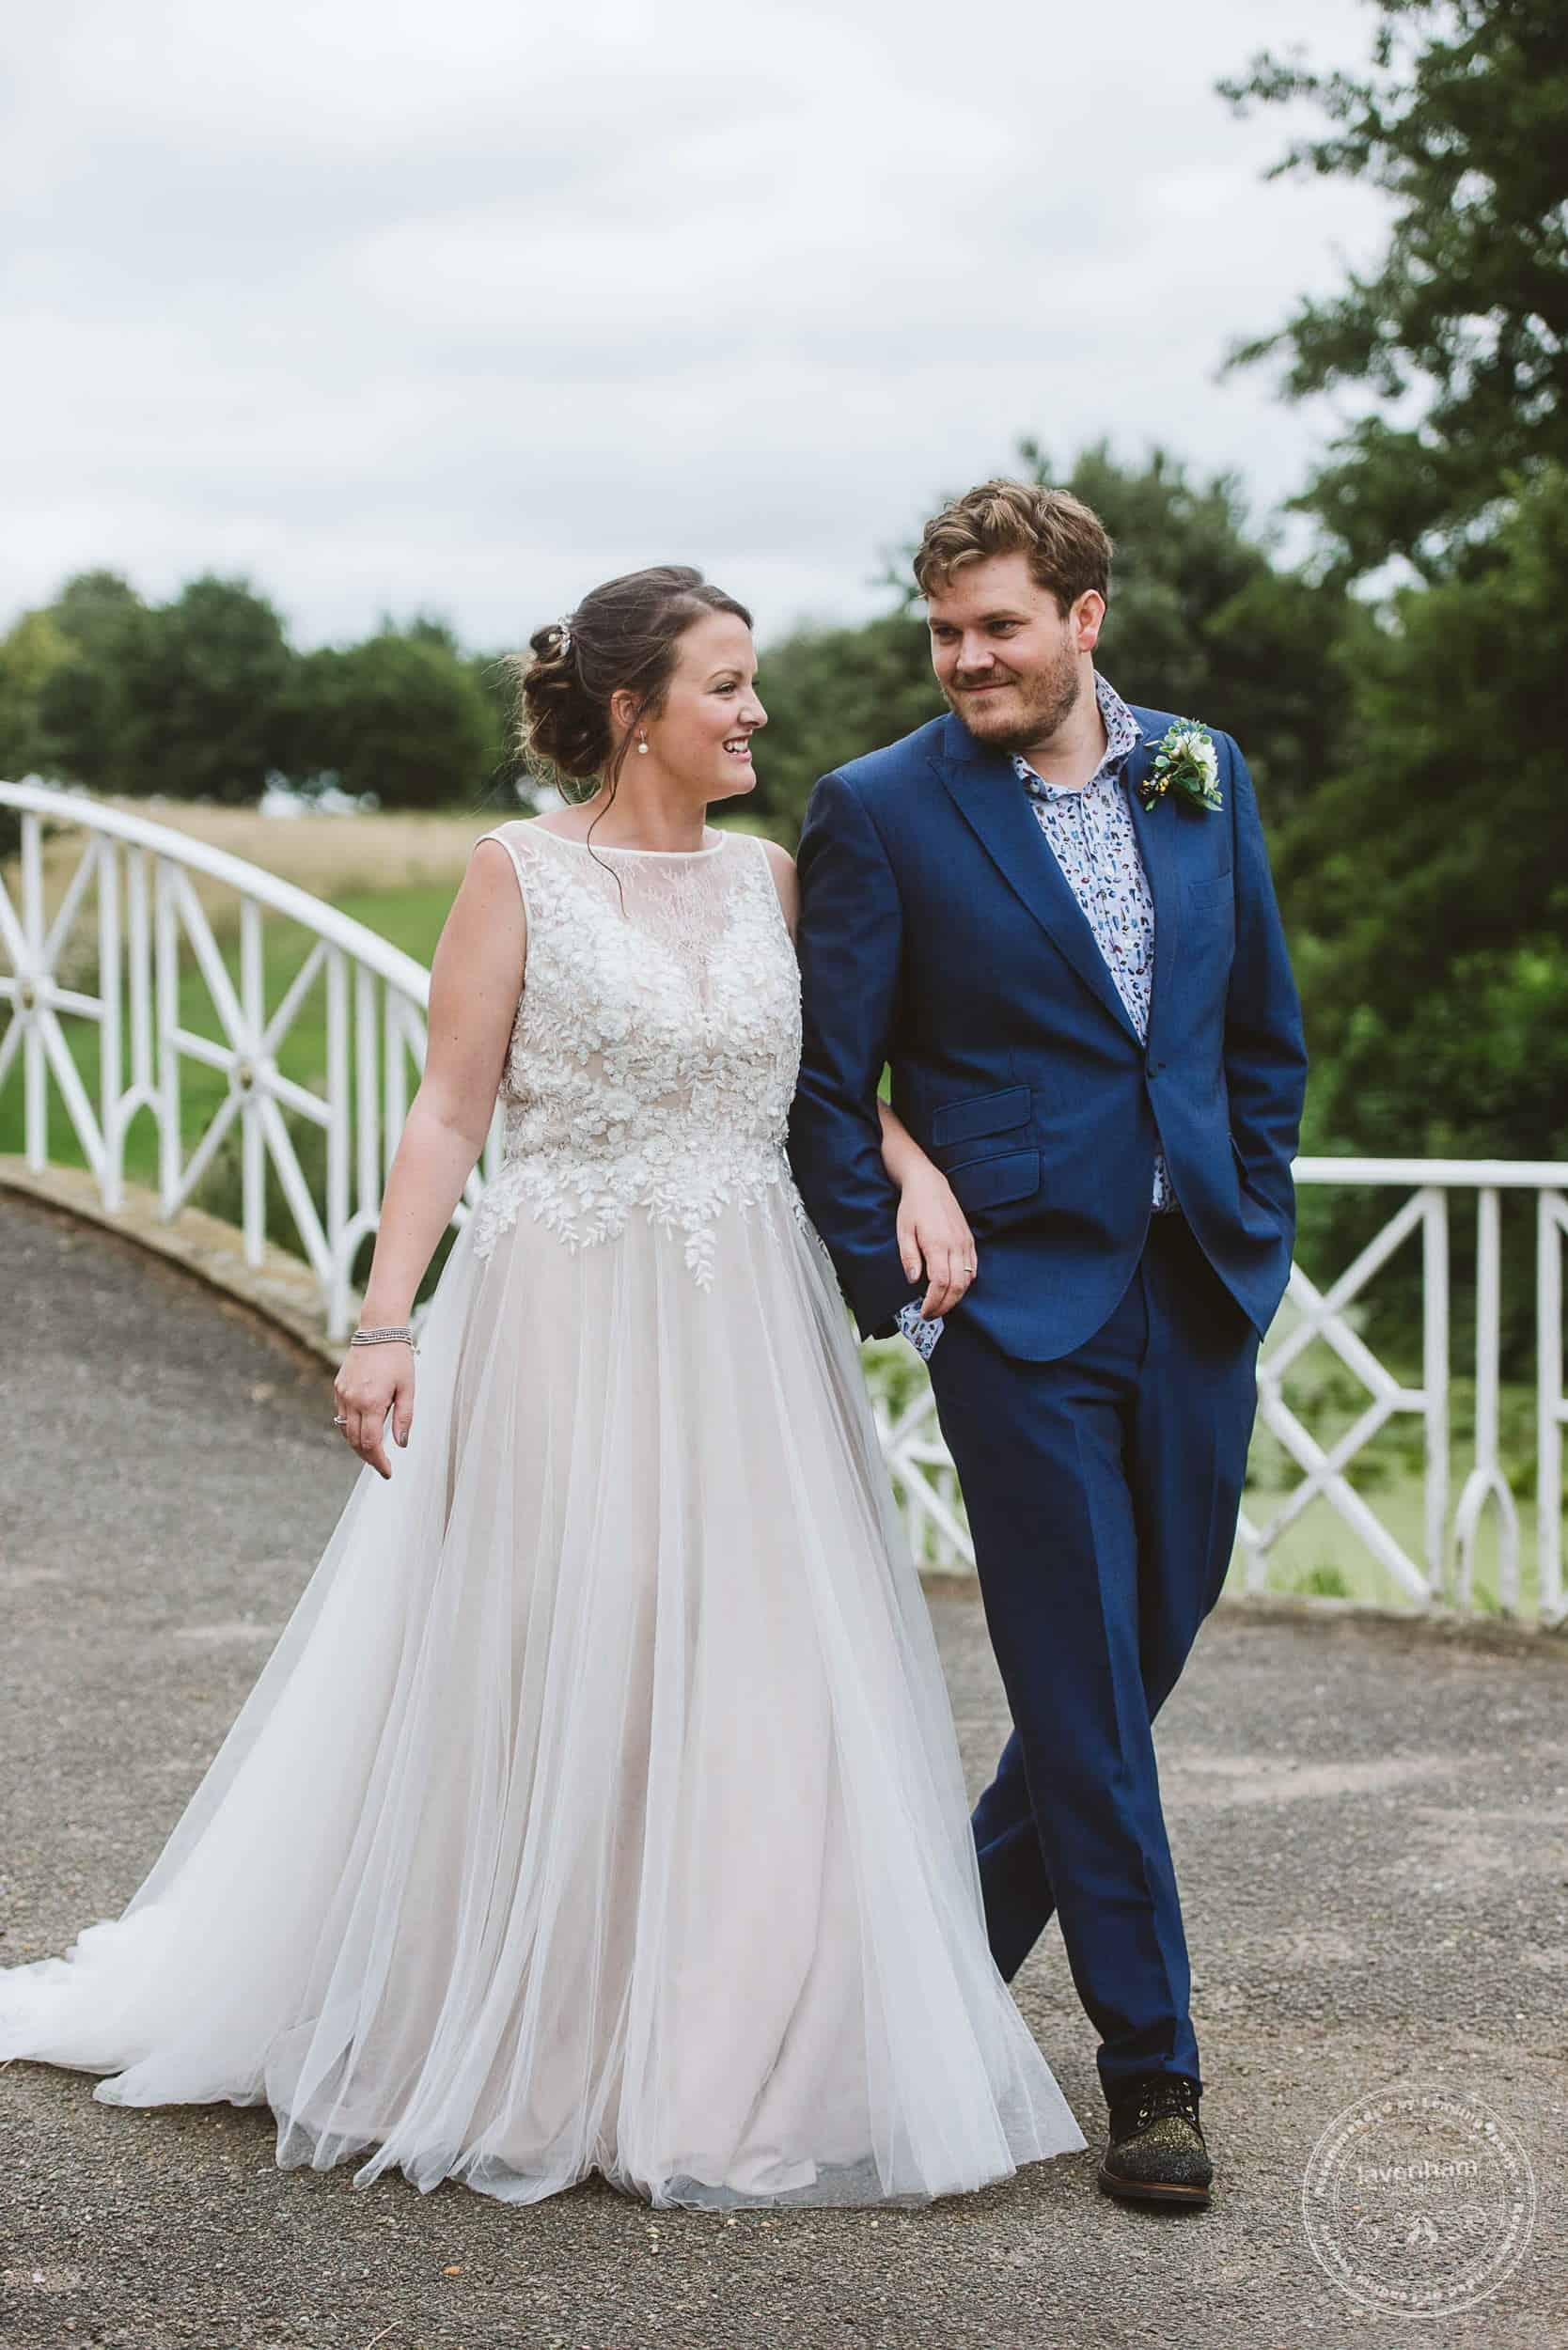 180818 Marks Hall Wedding Photography Lavenham Photographic 100